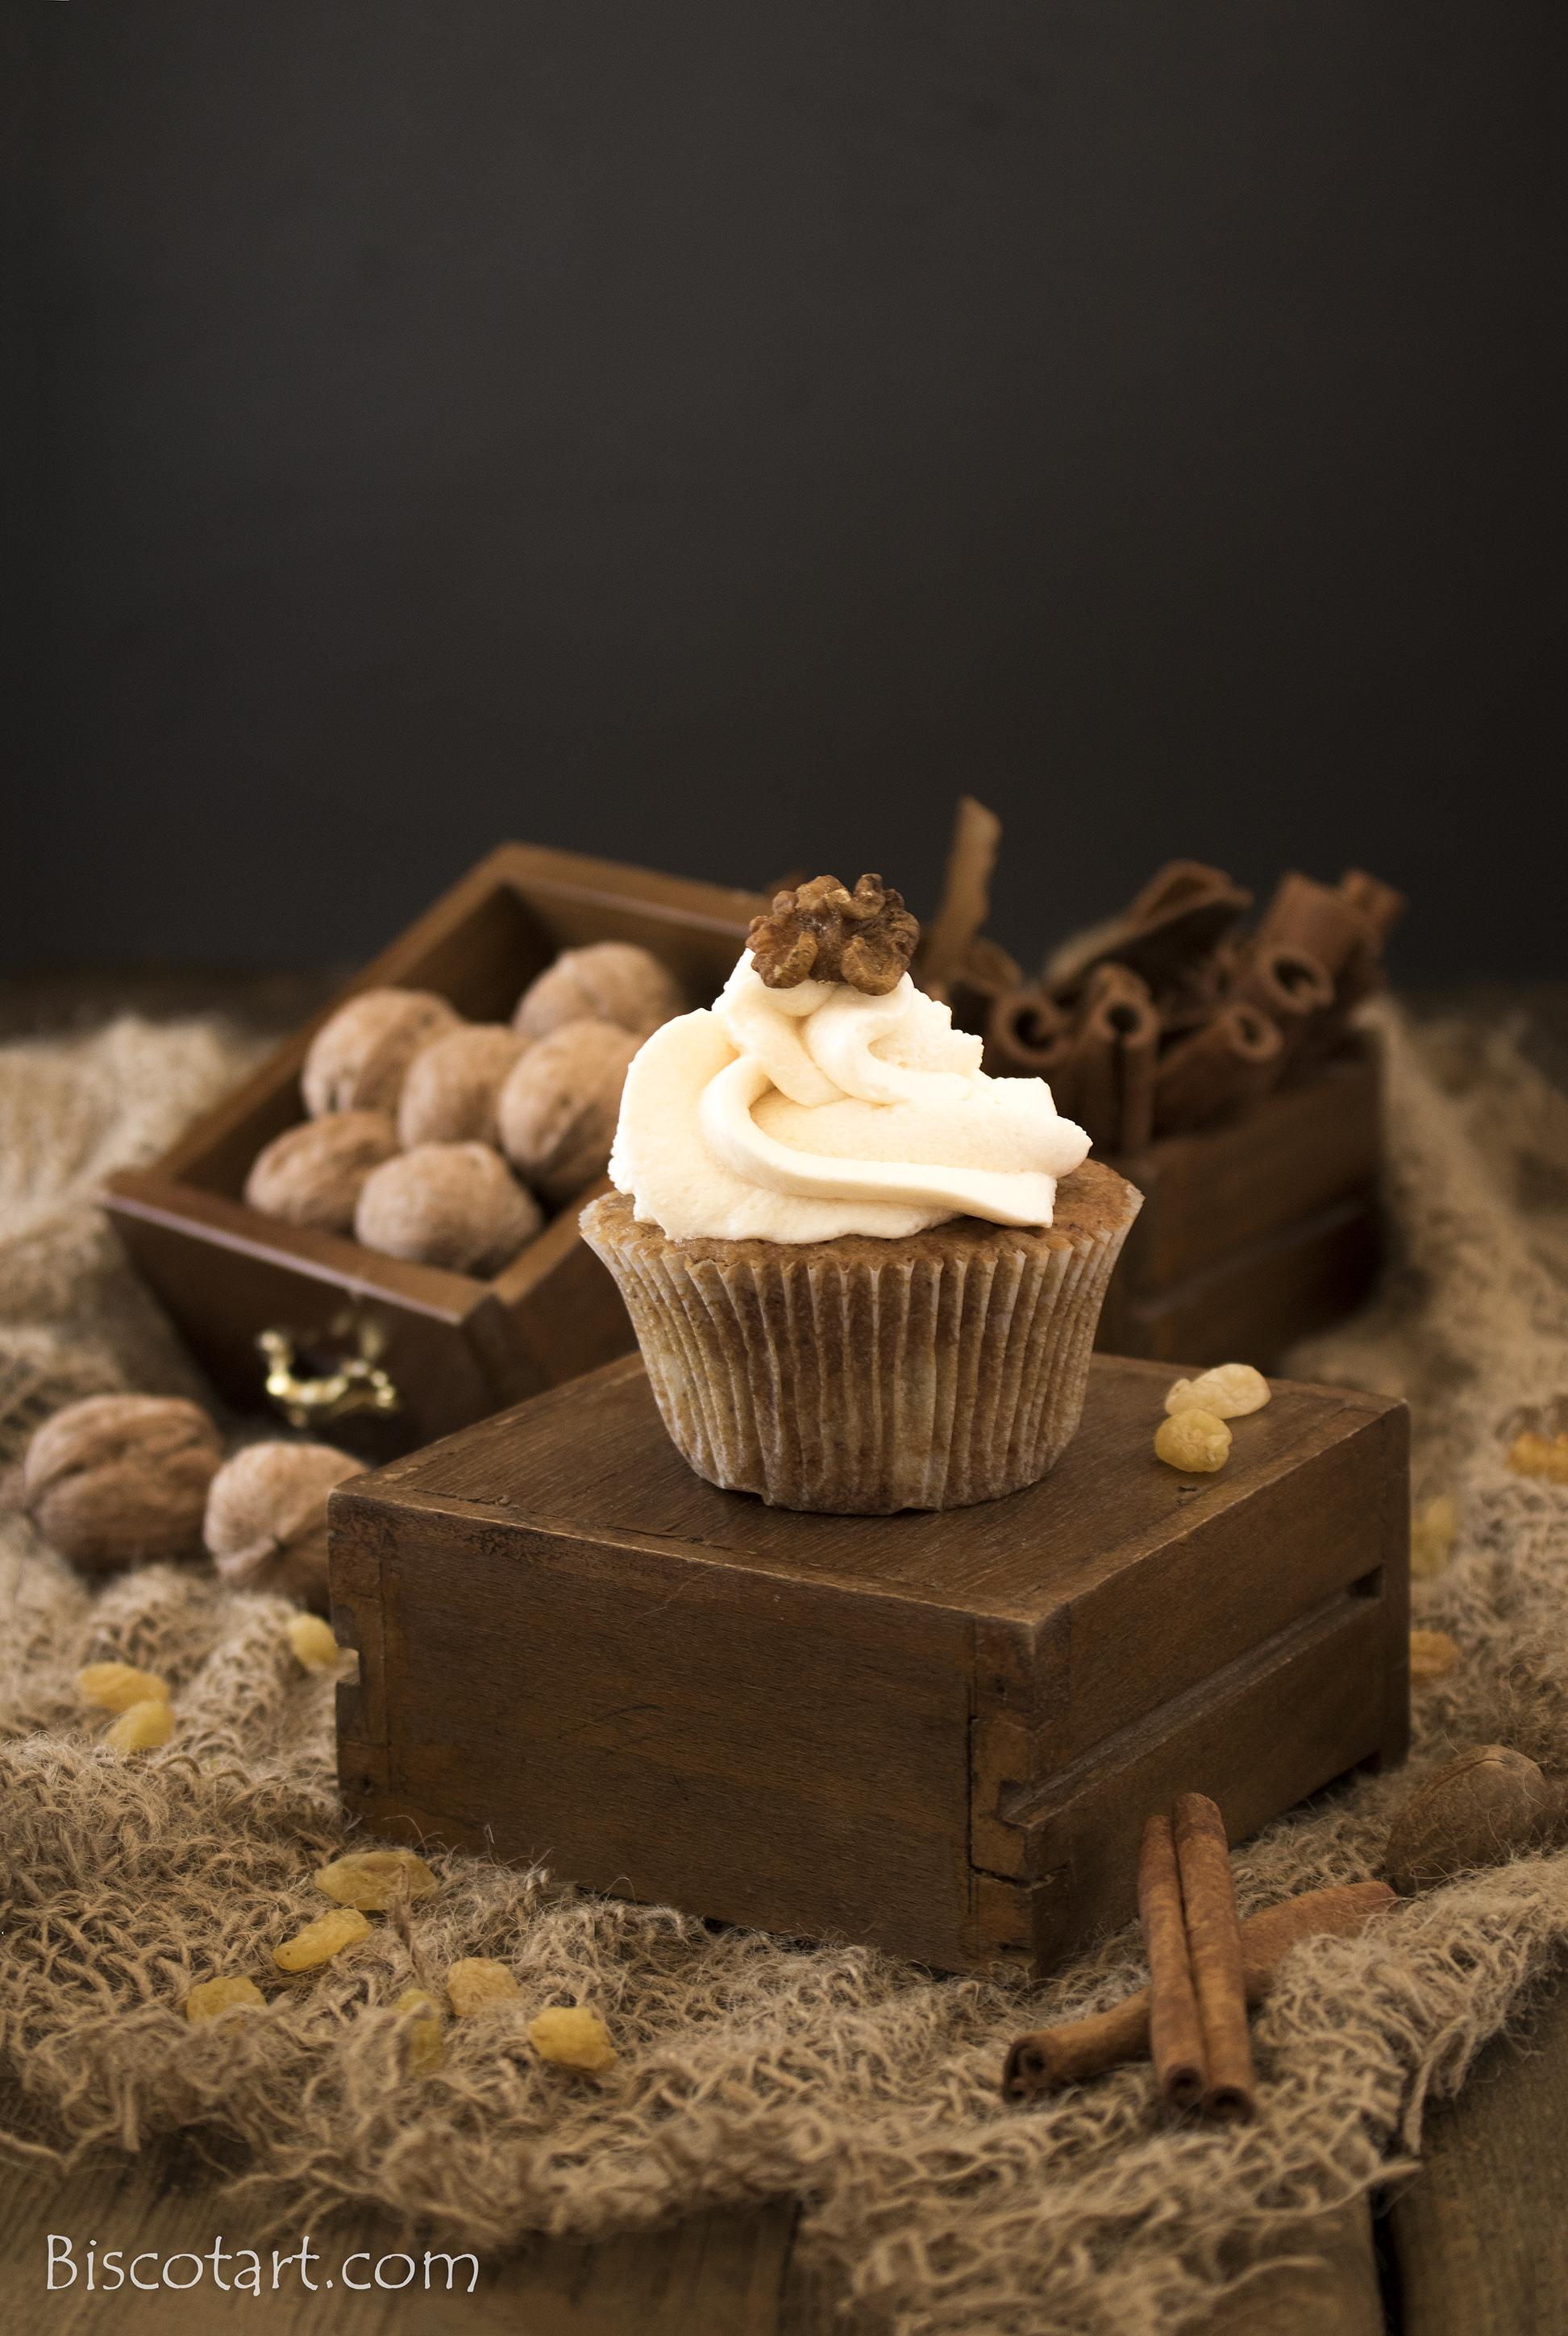 Spice cupcake with raisins